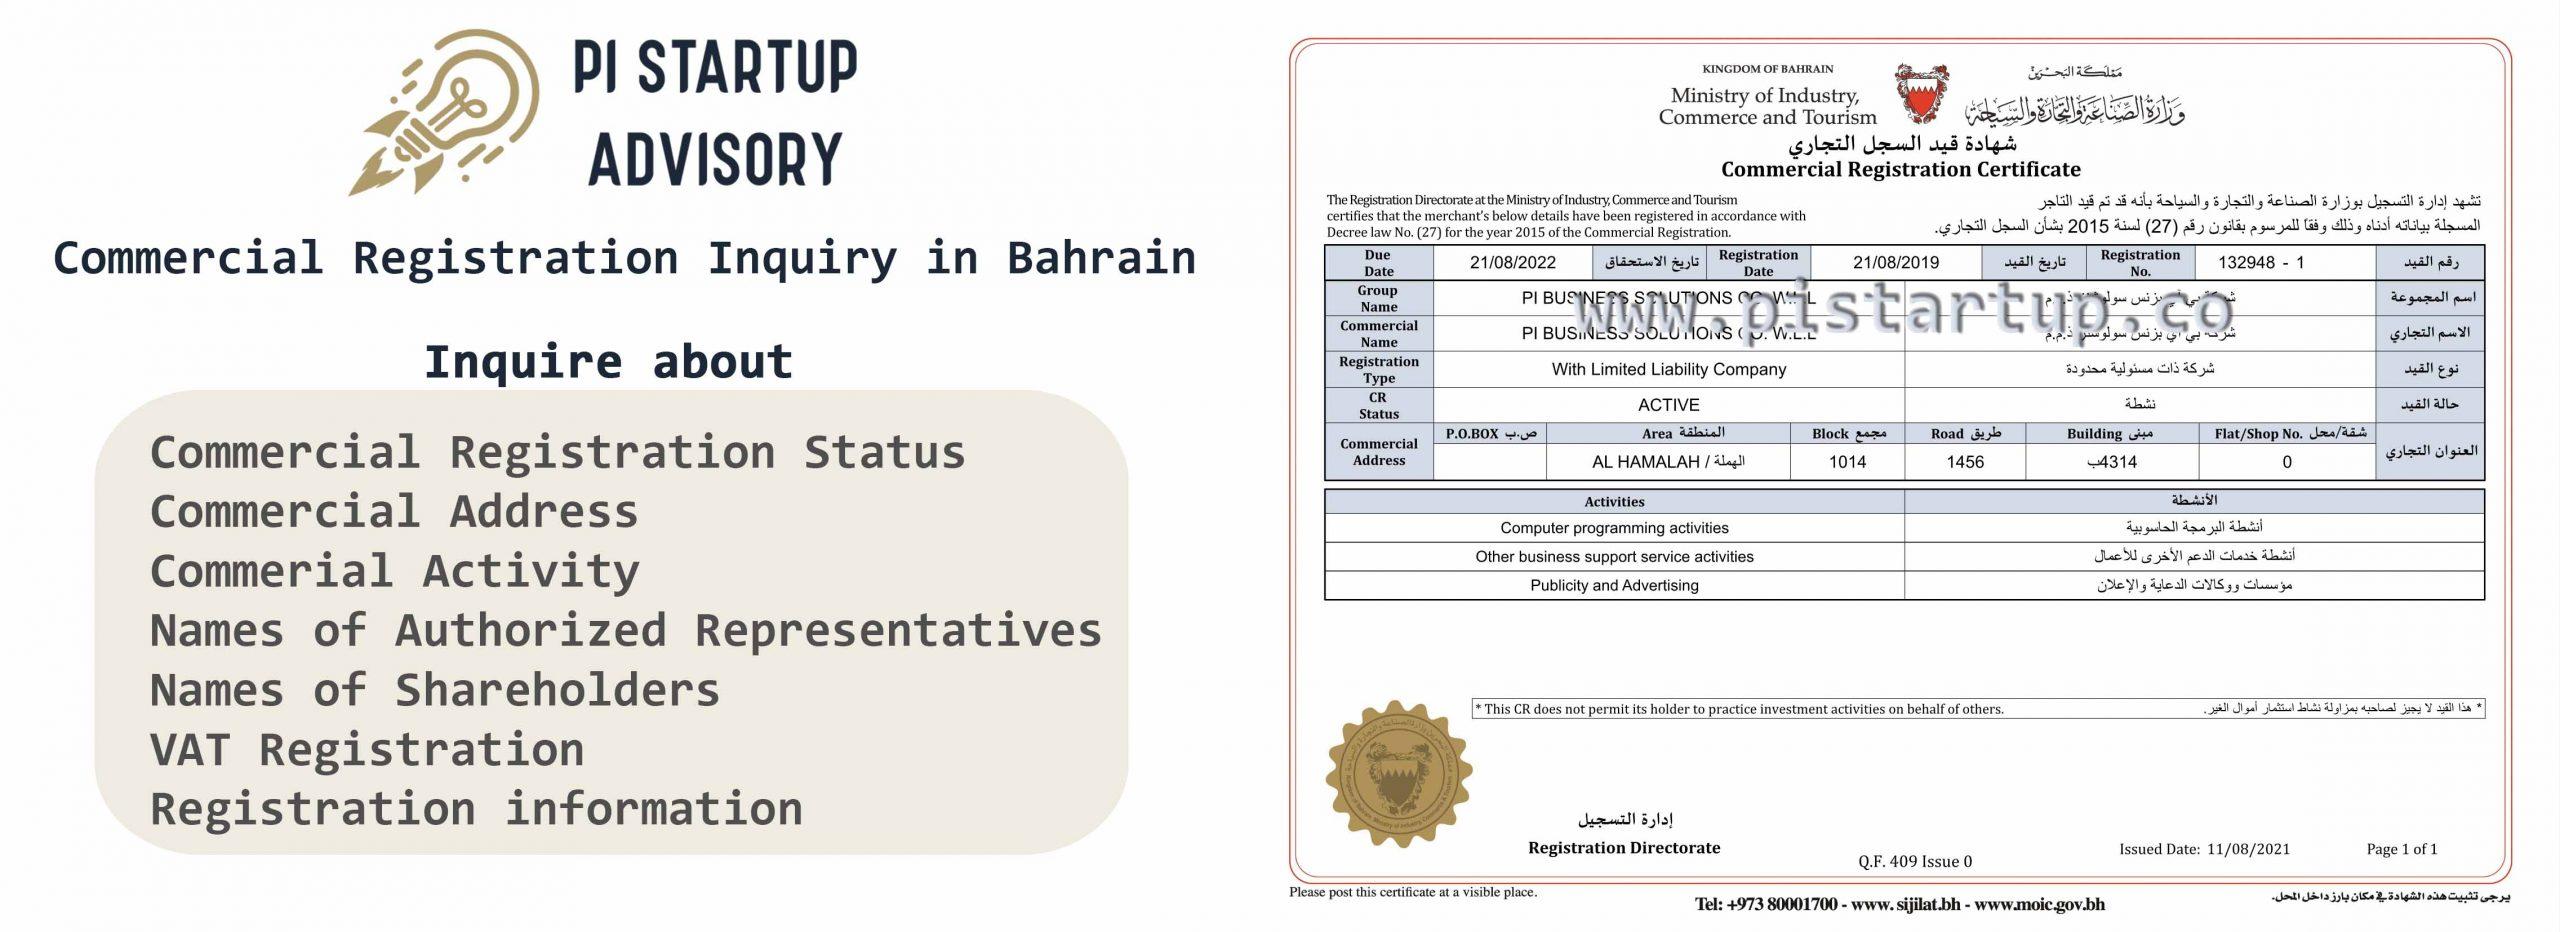 cr inquiry bahrain - commercial registration inquiry bahrain